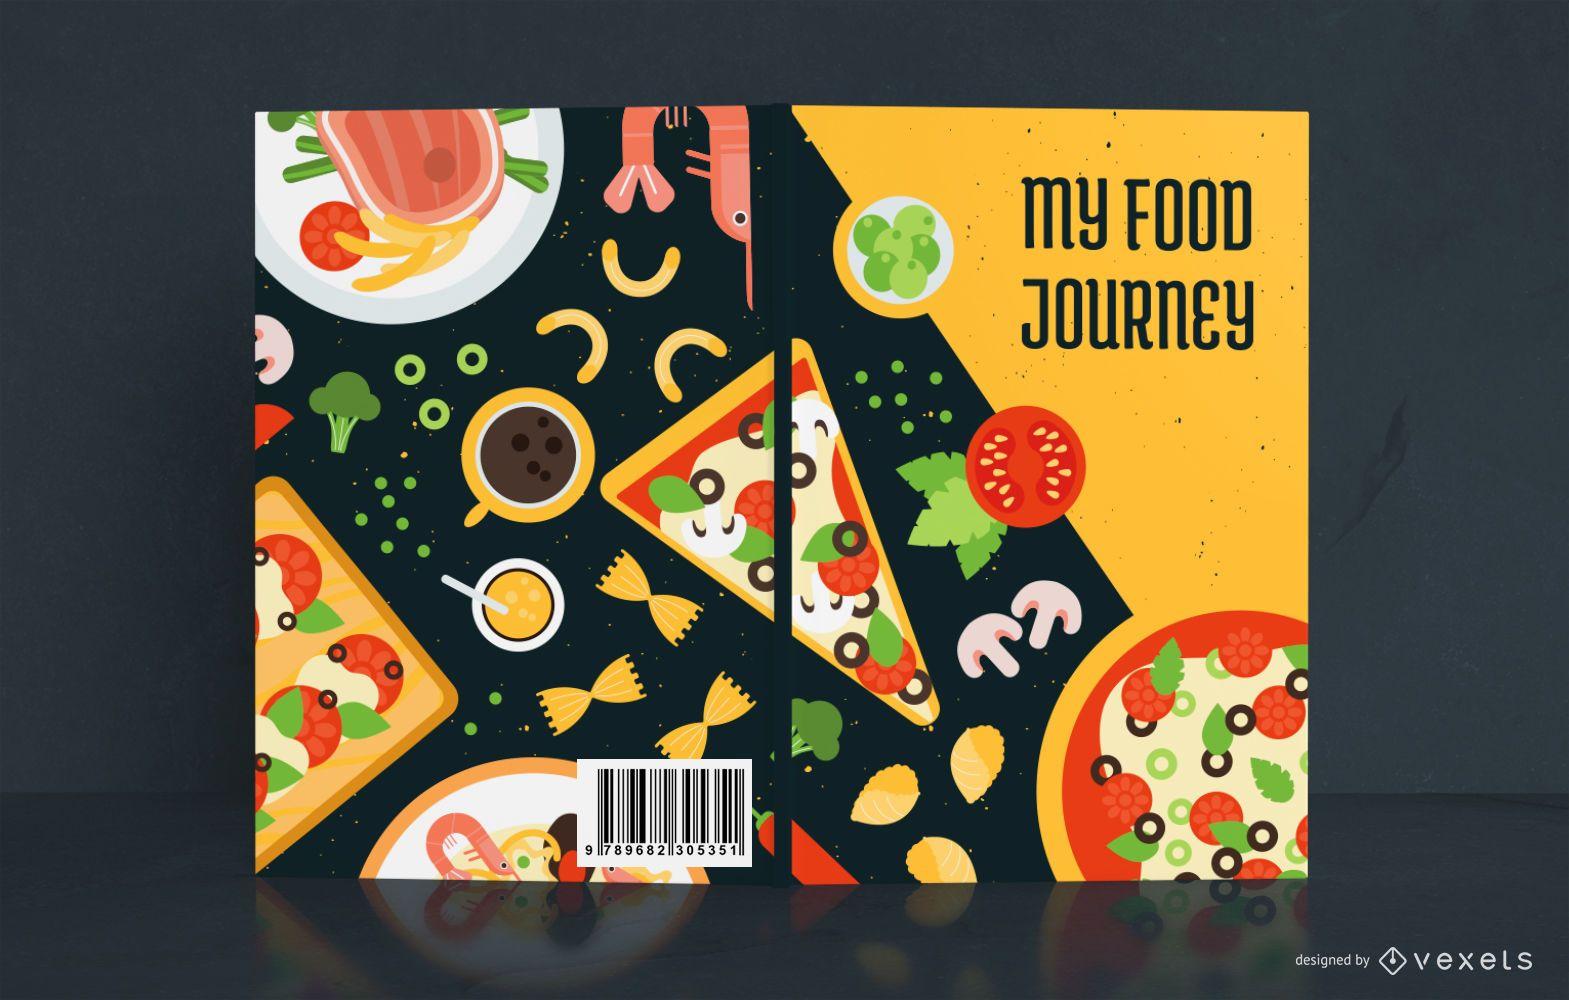 Dise?o de portada de libro My Food Journey